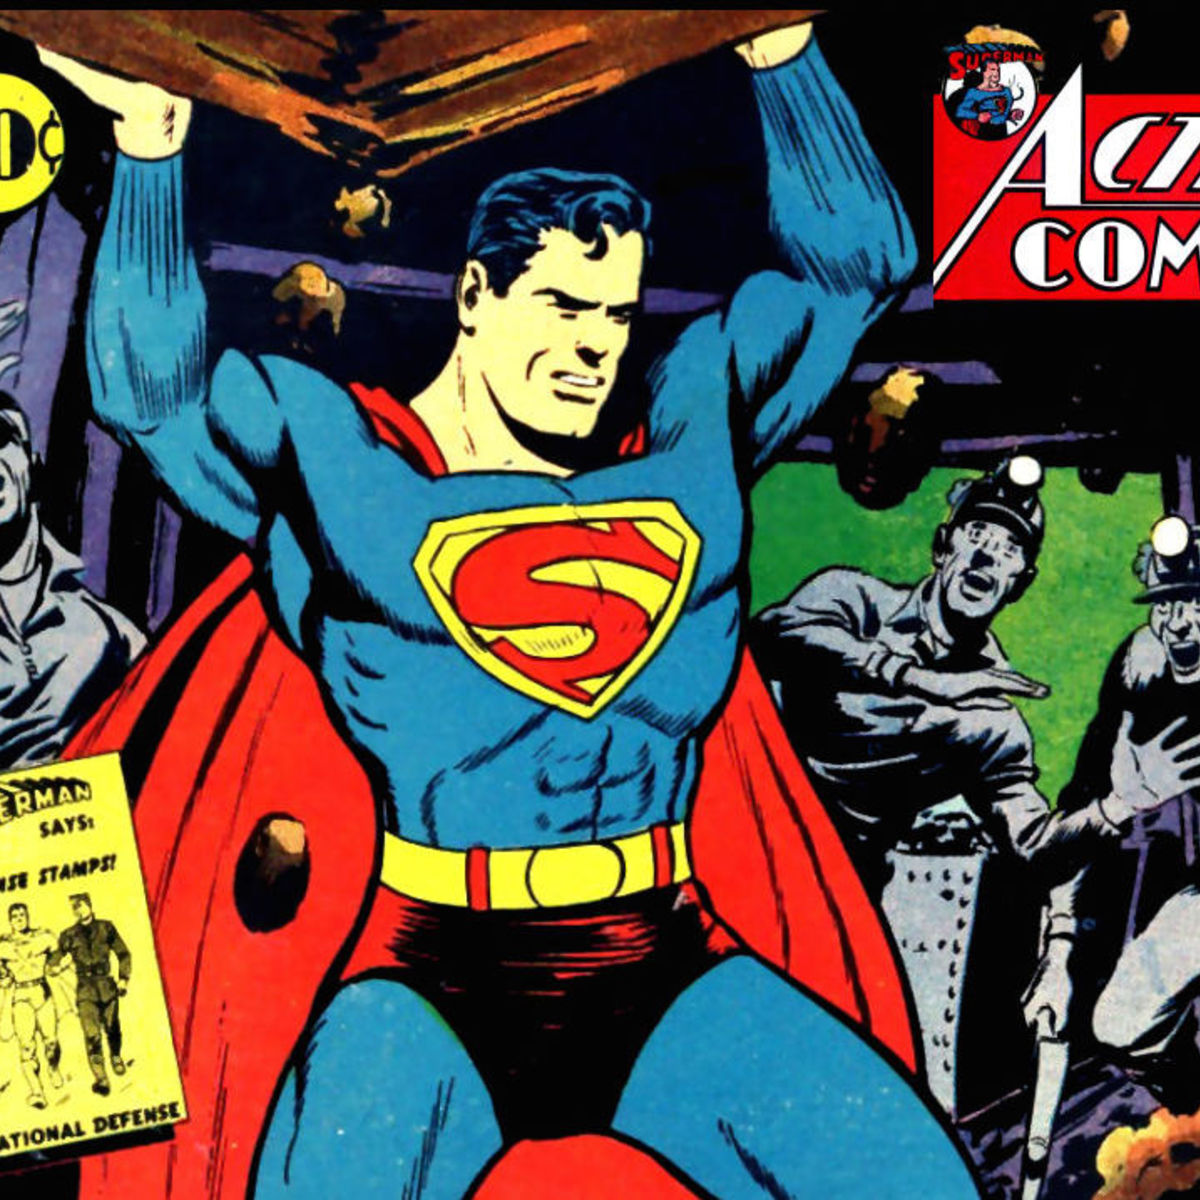 action_comics_50_by_superman8193-d4e7kab.jpg